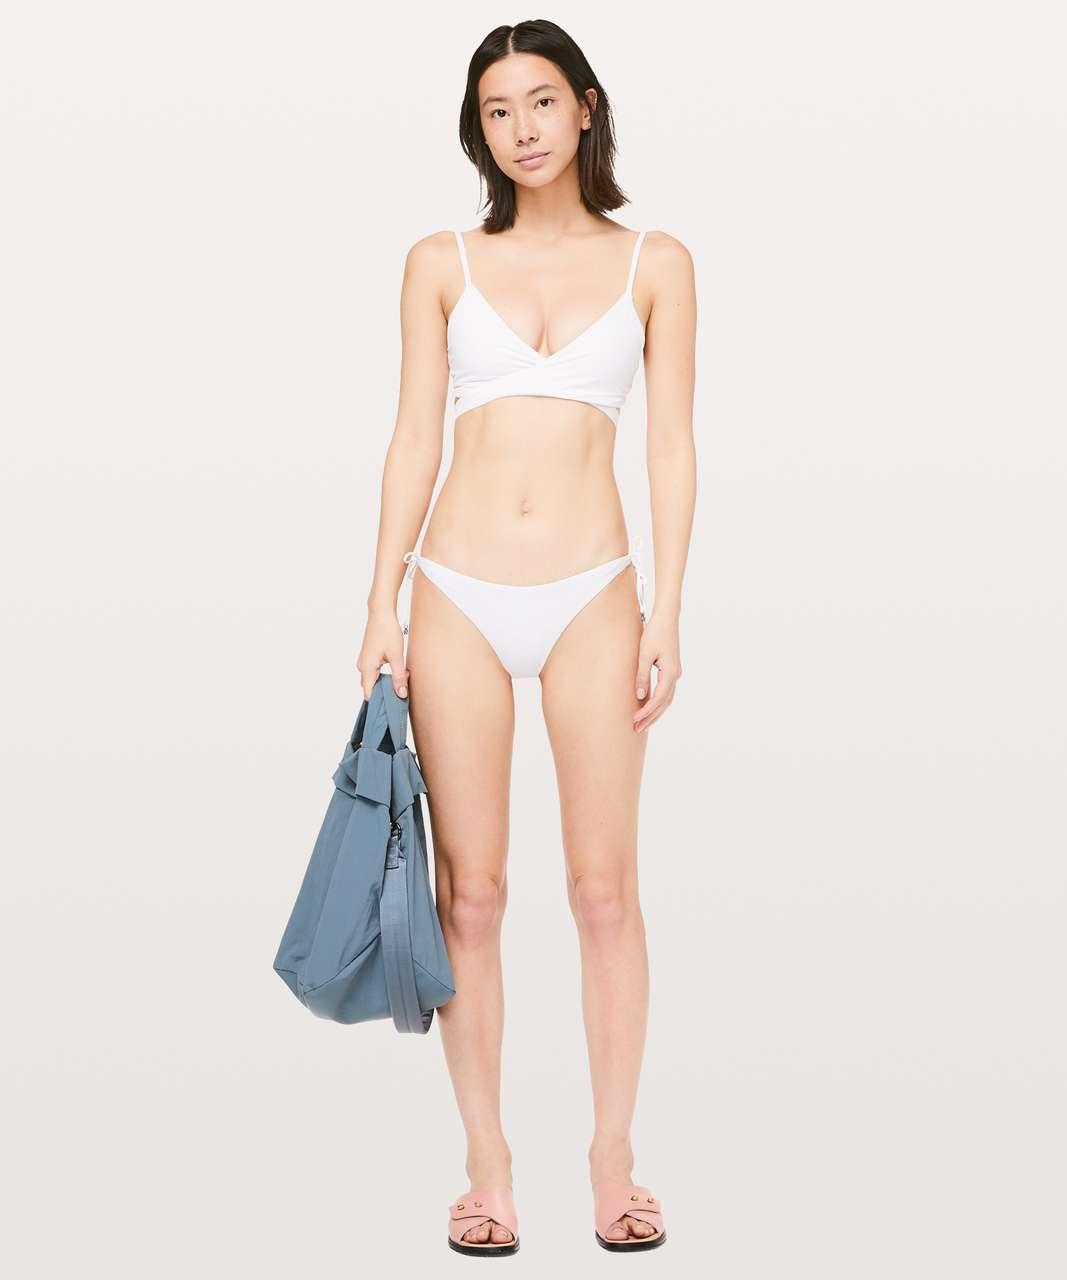 Lululemon Tied To Tide Swim Top - White